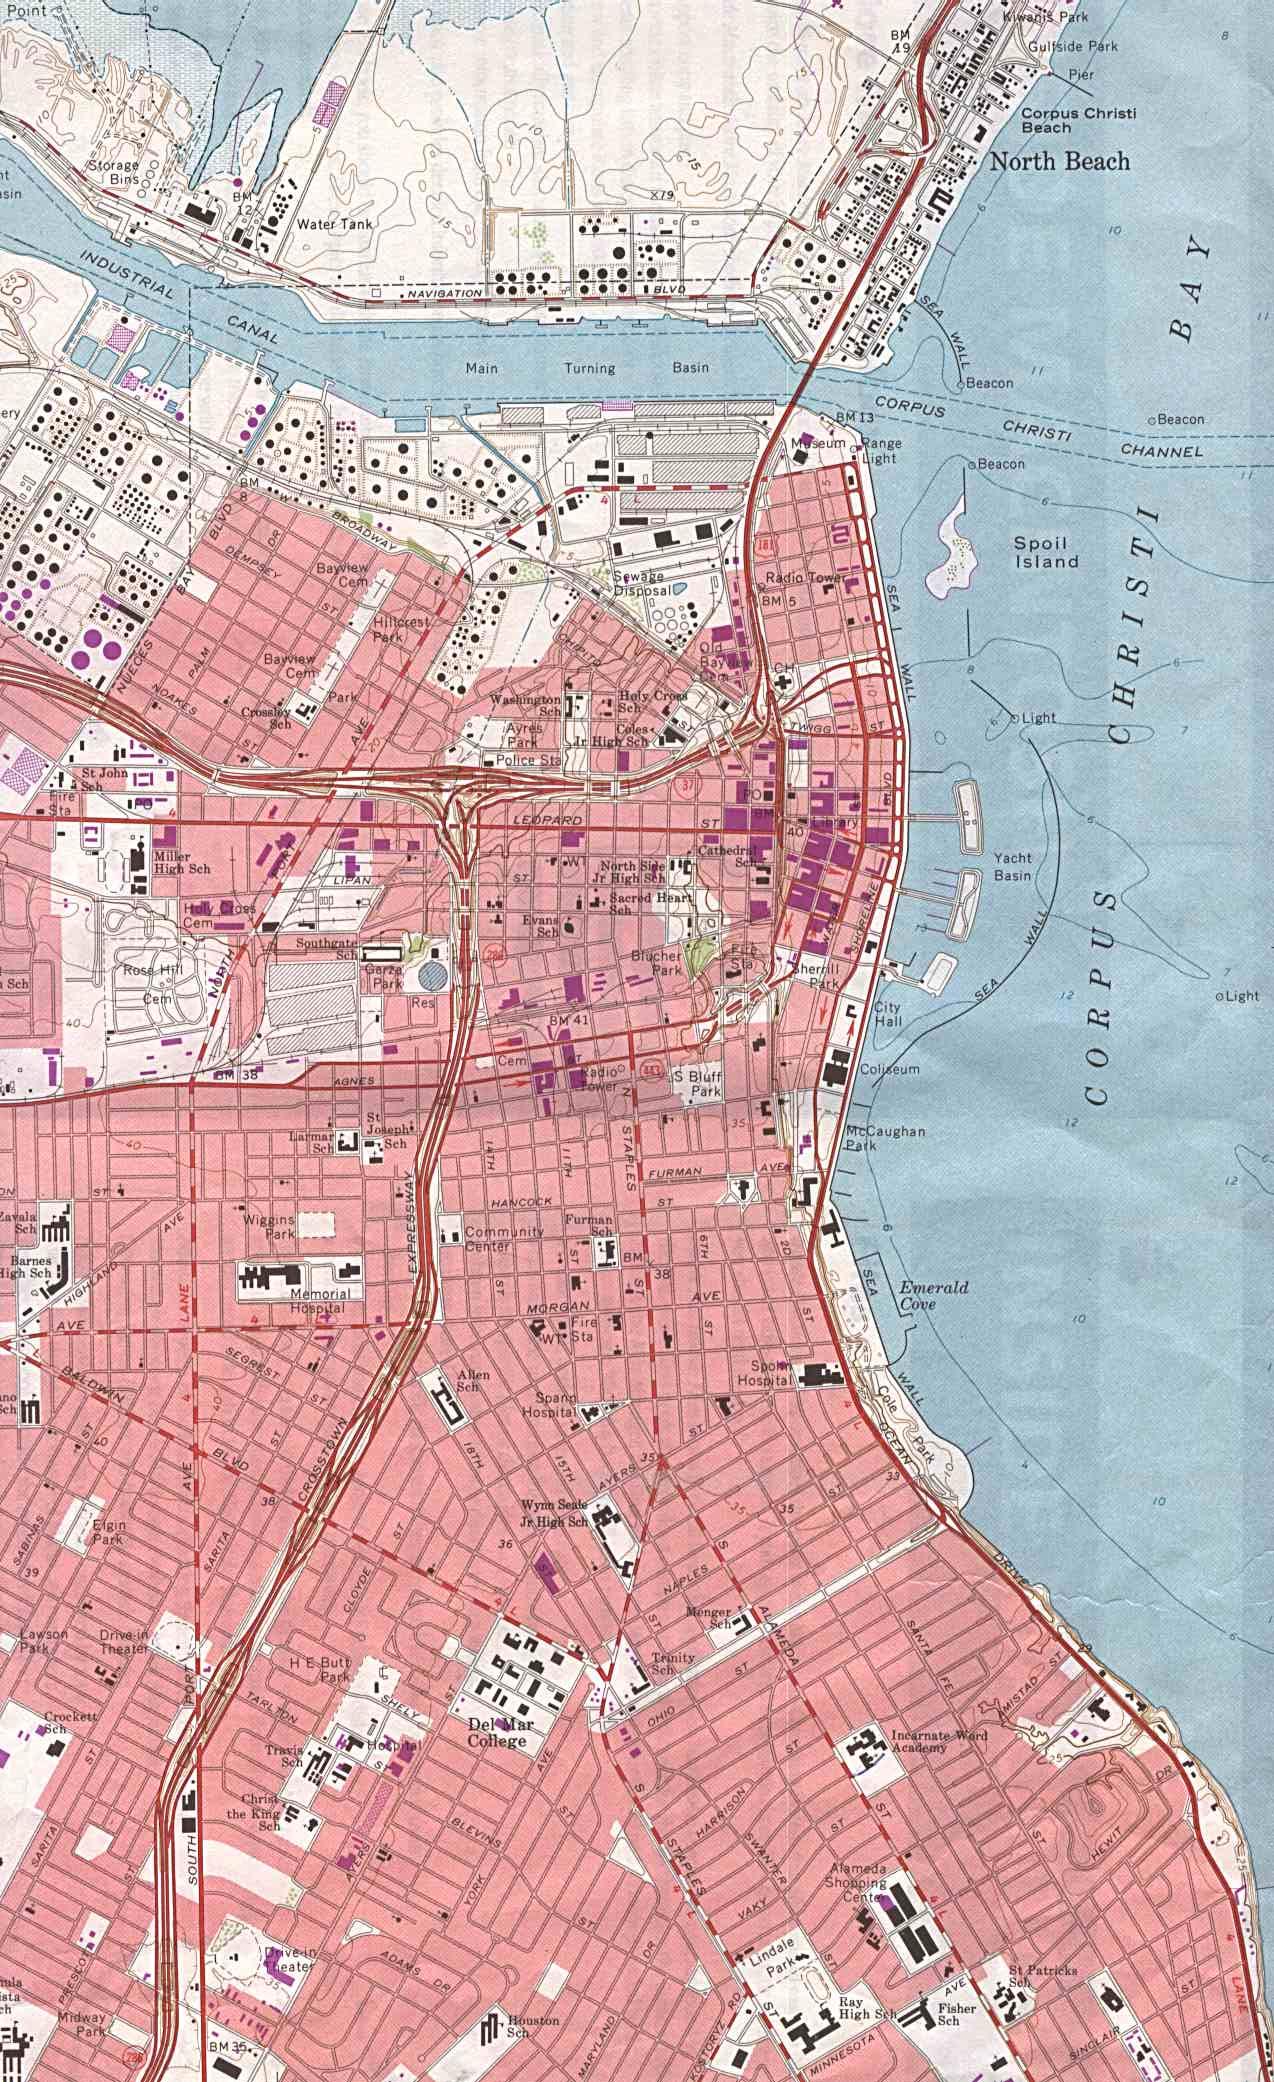 Texas City Maps - Perry-Castañeda Map Collection - UT ... on city of san francisco california map, city of atlanta georgia map, city of louisville kentucky map, city of durham north carolina map, city of indianapolis indiana map, city of baton rouge louisiana map, city of chattanooga tennessee map, city of buffalo new york map, city of bakersfield california map, city of cincinnati ohio map, chicago texas map, city of baltimore maryland map, city of corpus christi flag, city of newark new jersey map, city of denver colorado map, city of anchorage alaska map, city of des moines iowa map, city of las vegas nevada map, city of knoxville tennessee map, city of boston massachusetts map,